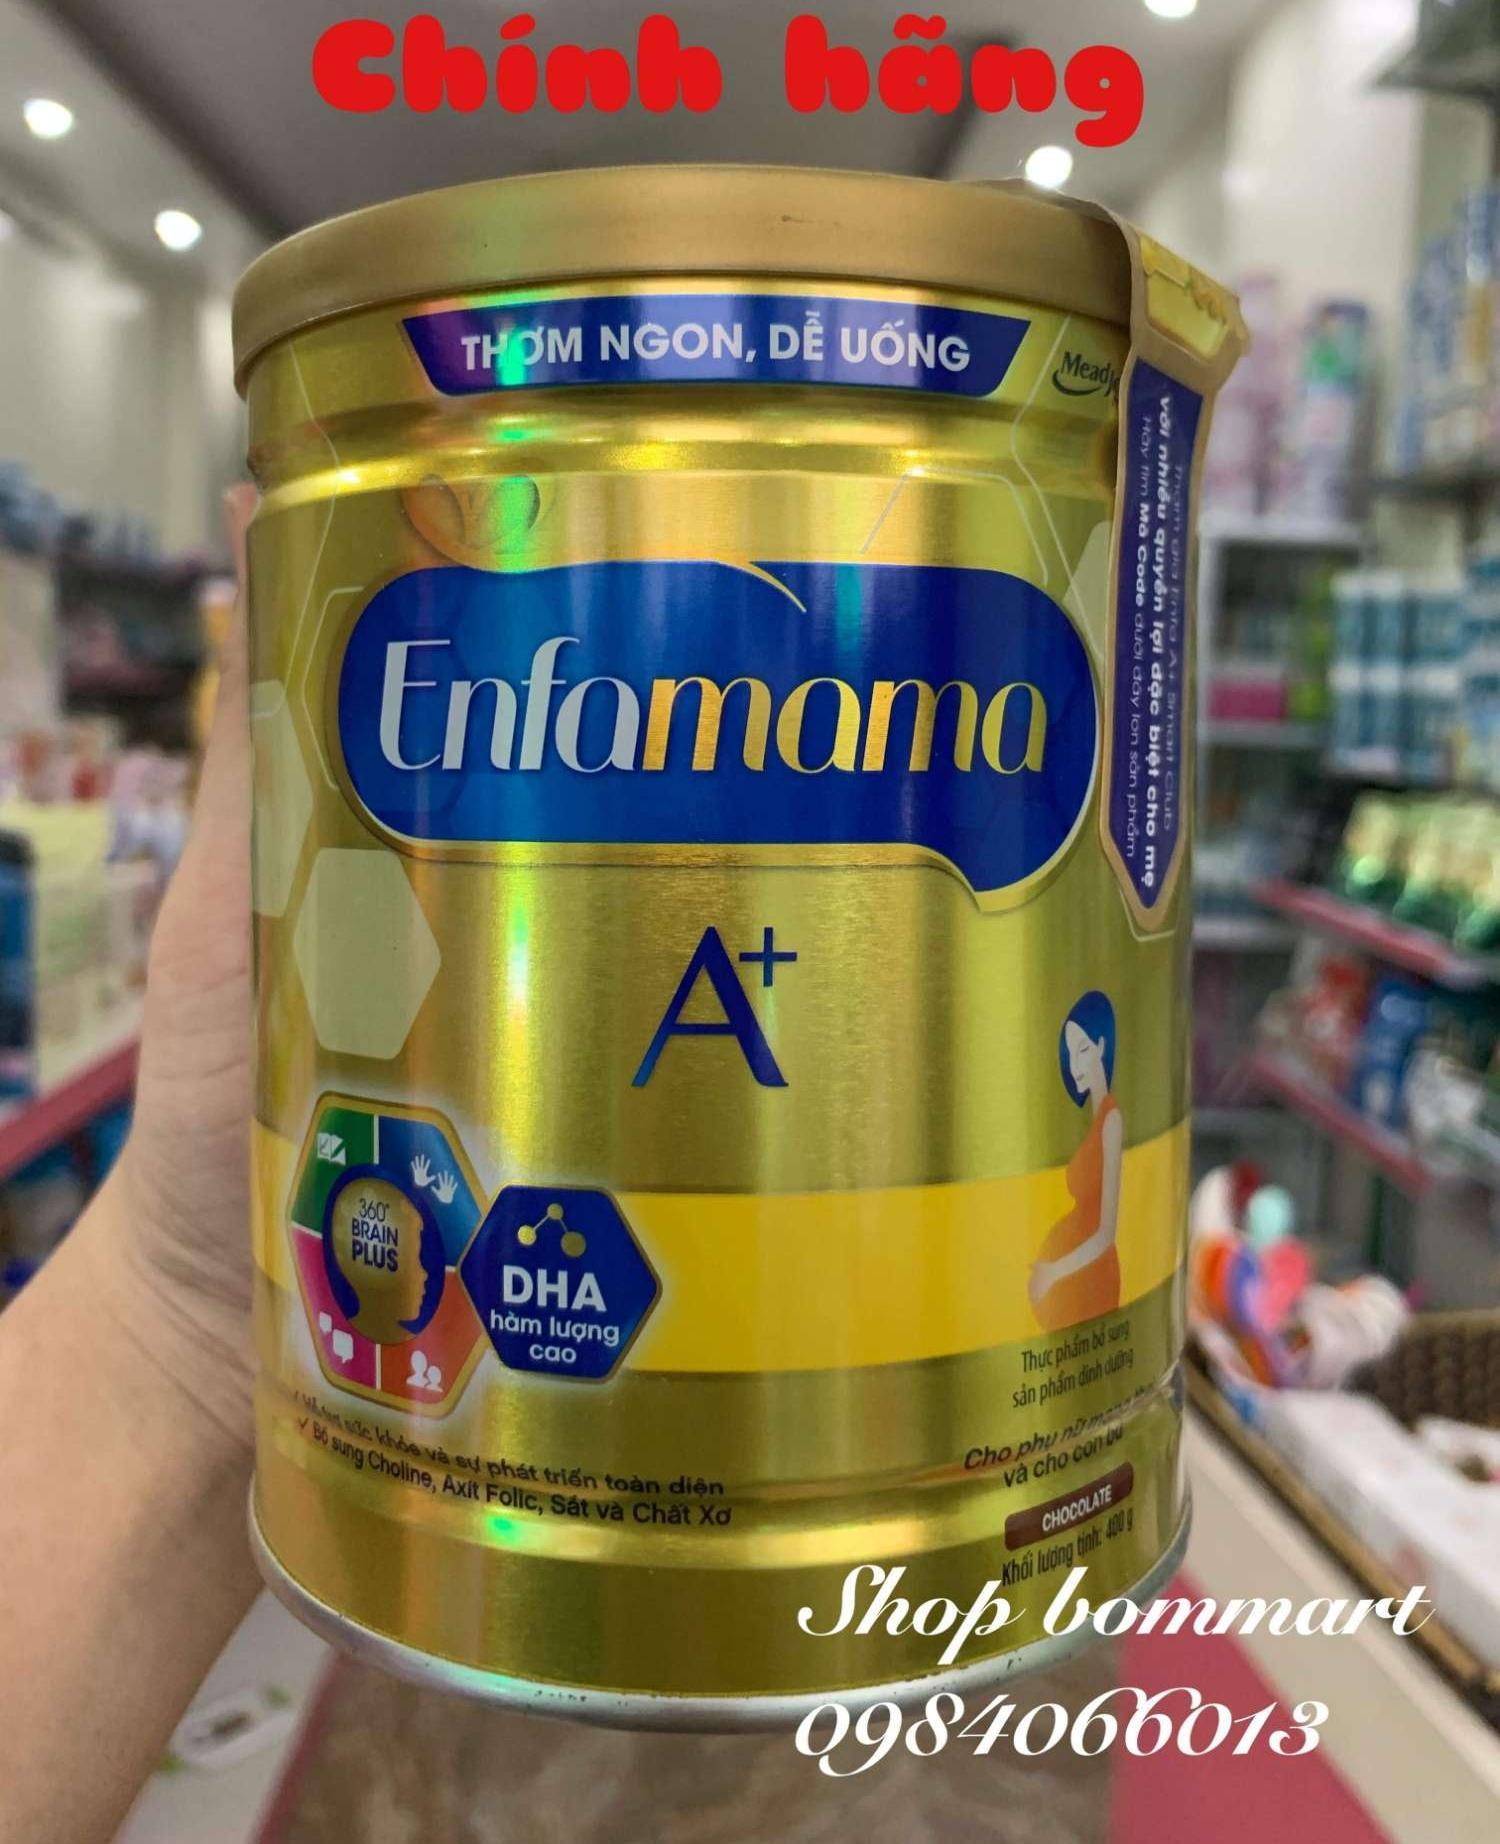 Sữa bầu enfamama a+ vị chocolate hộp 400g nhập khẩu